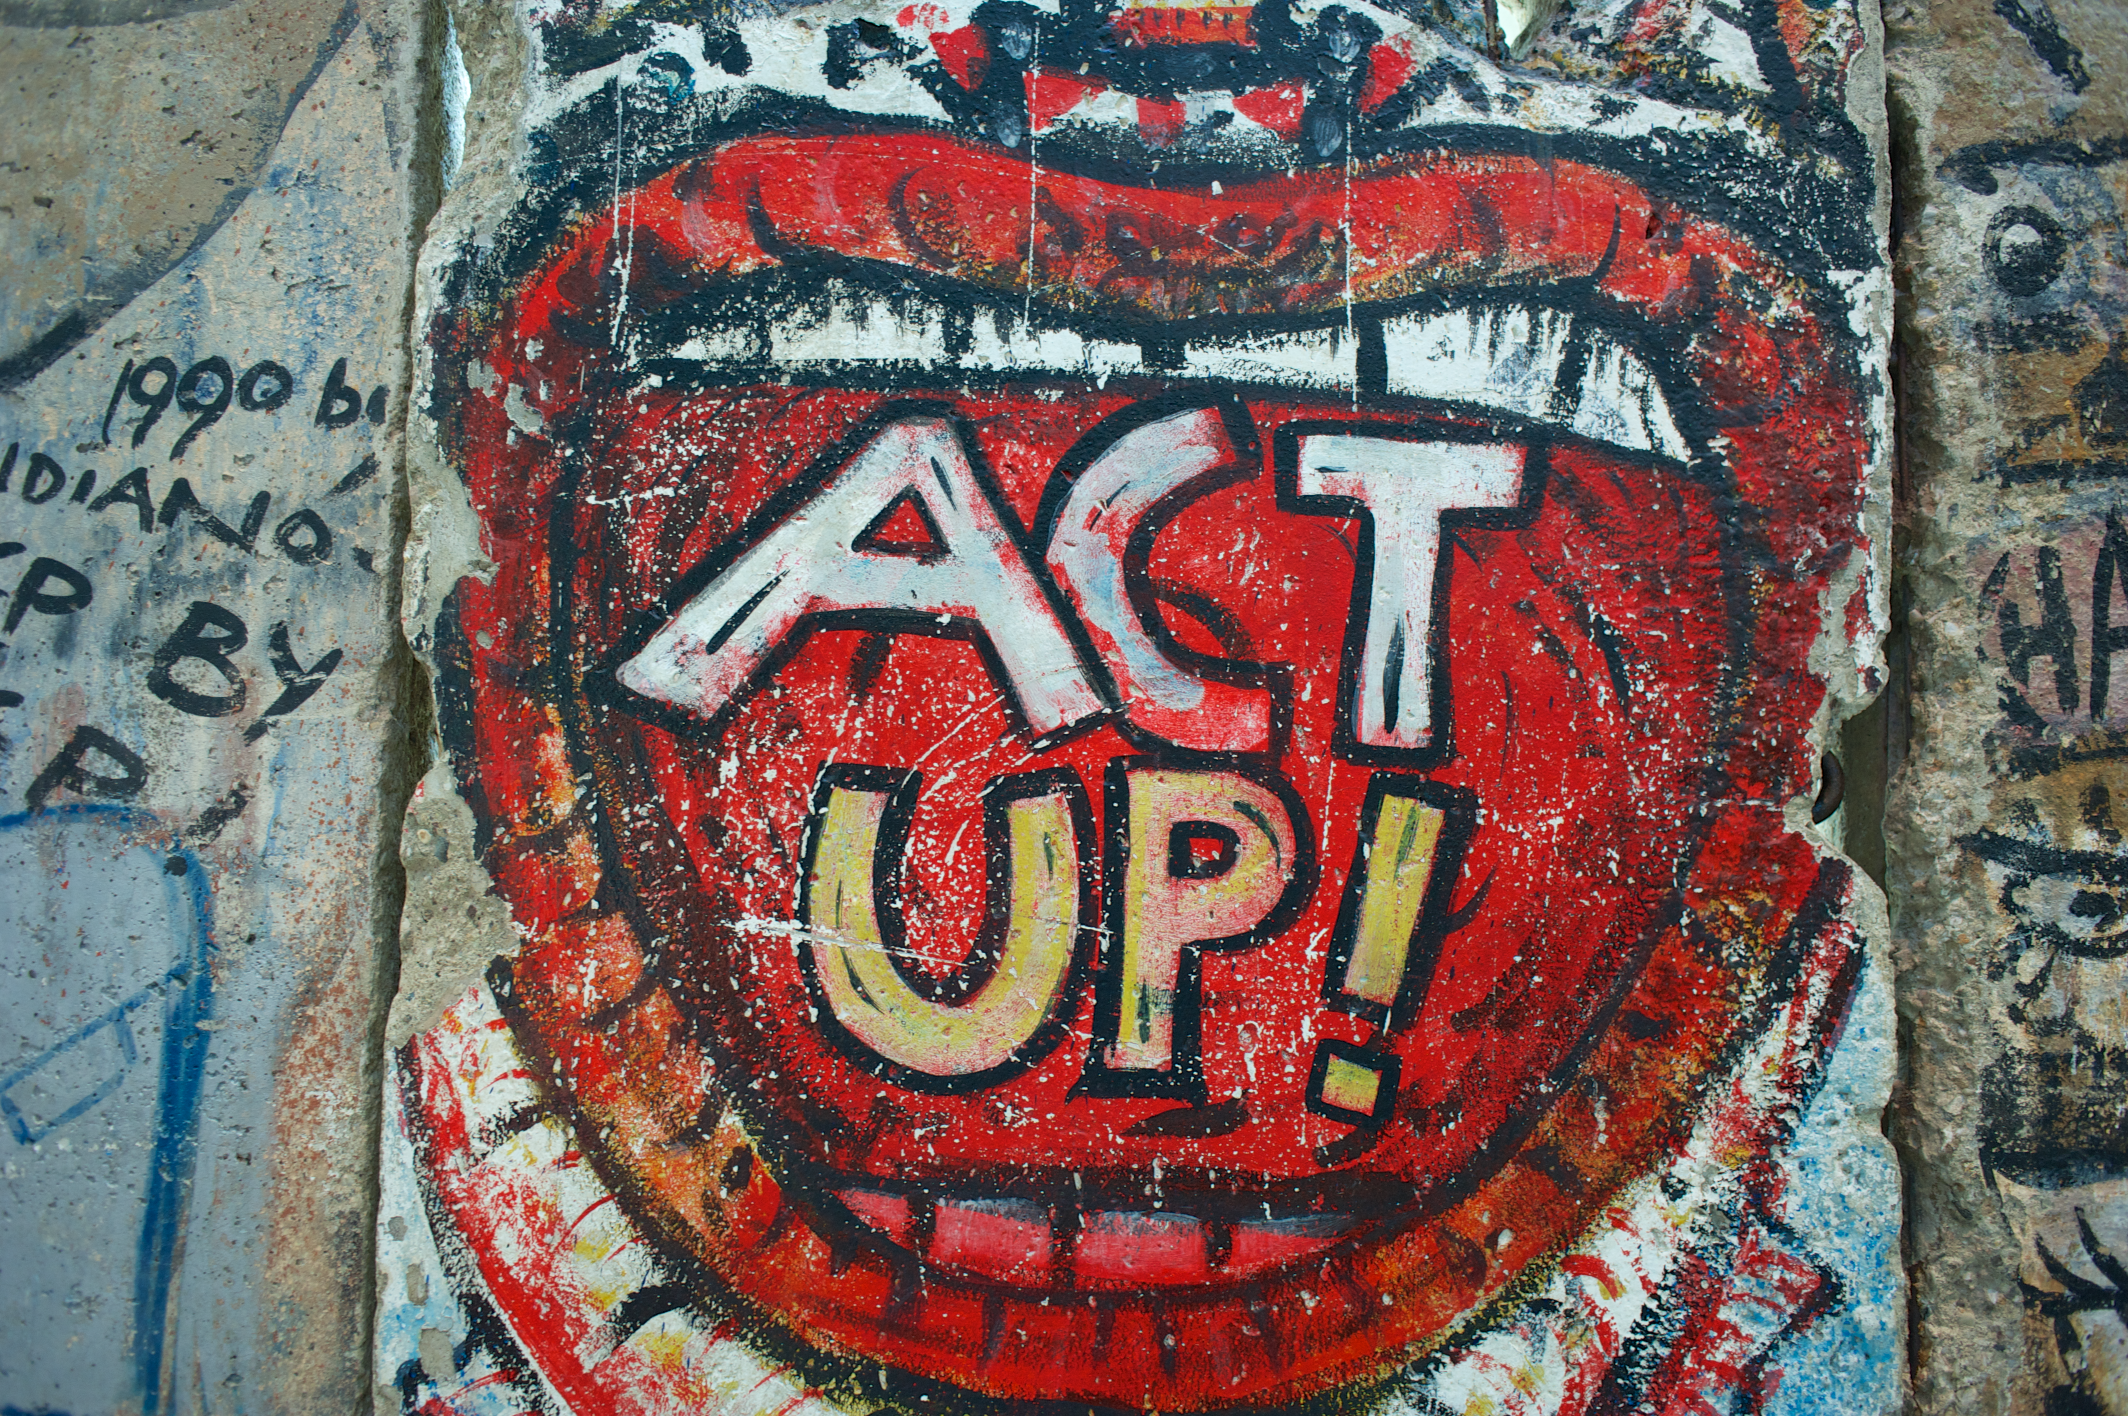 Berlin Wall panels 358